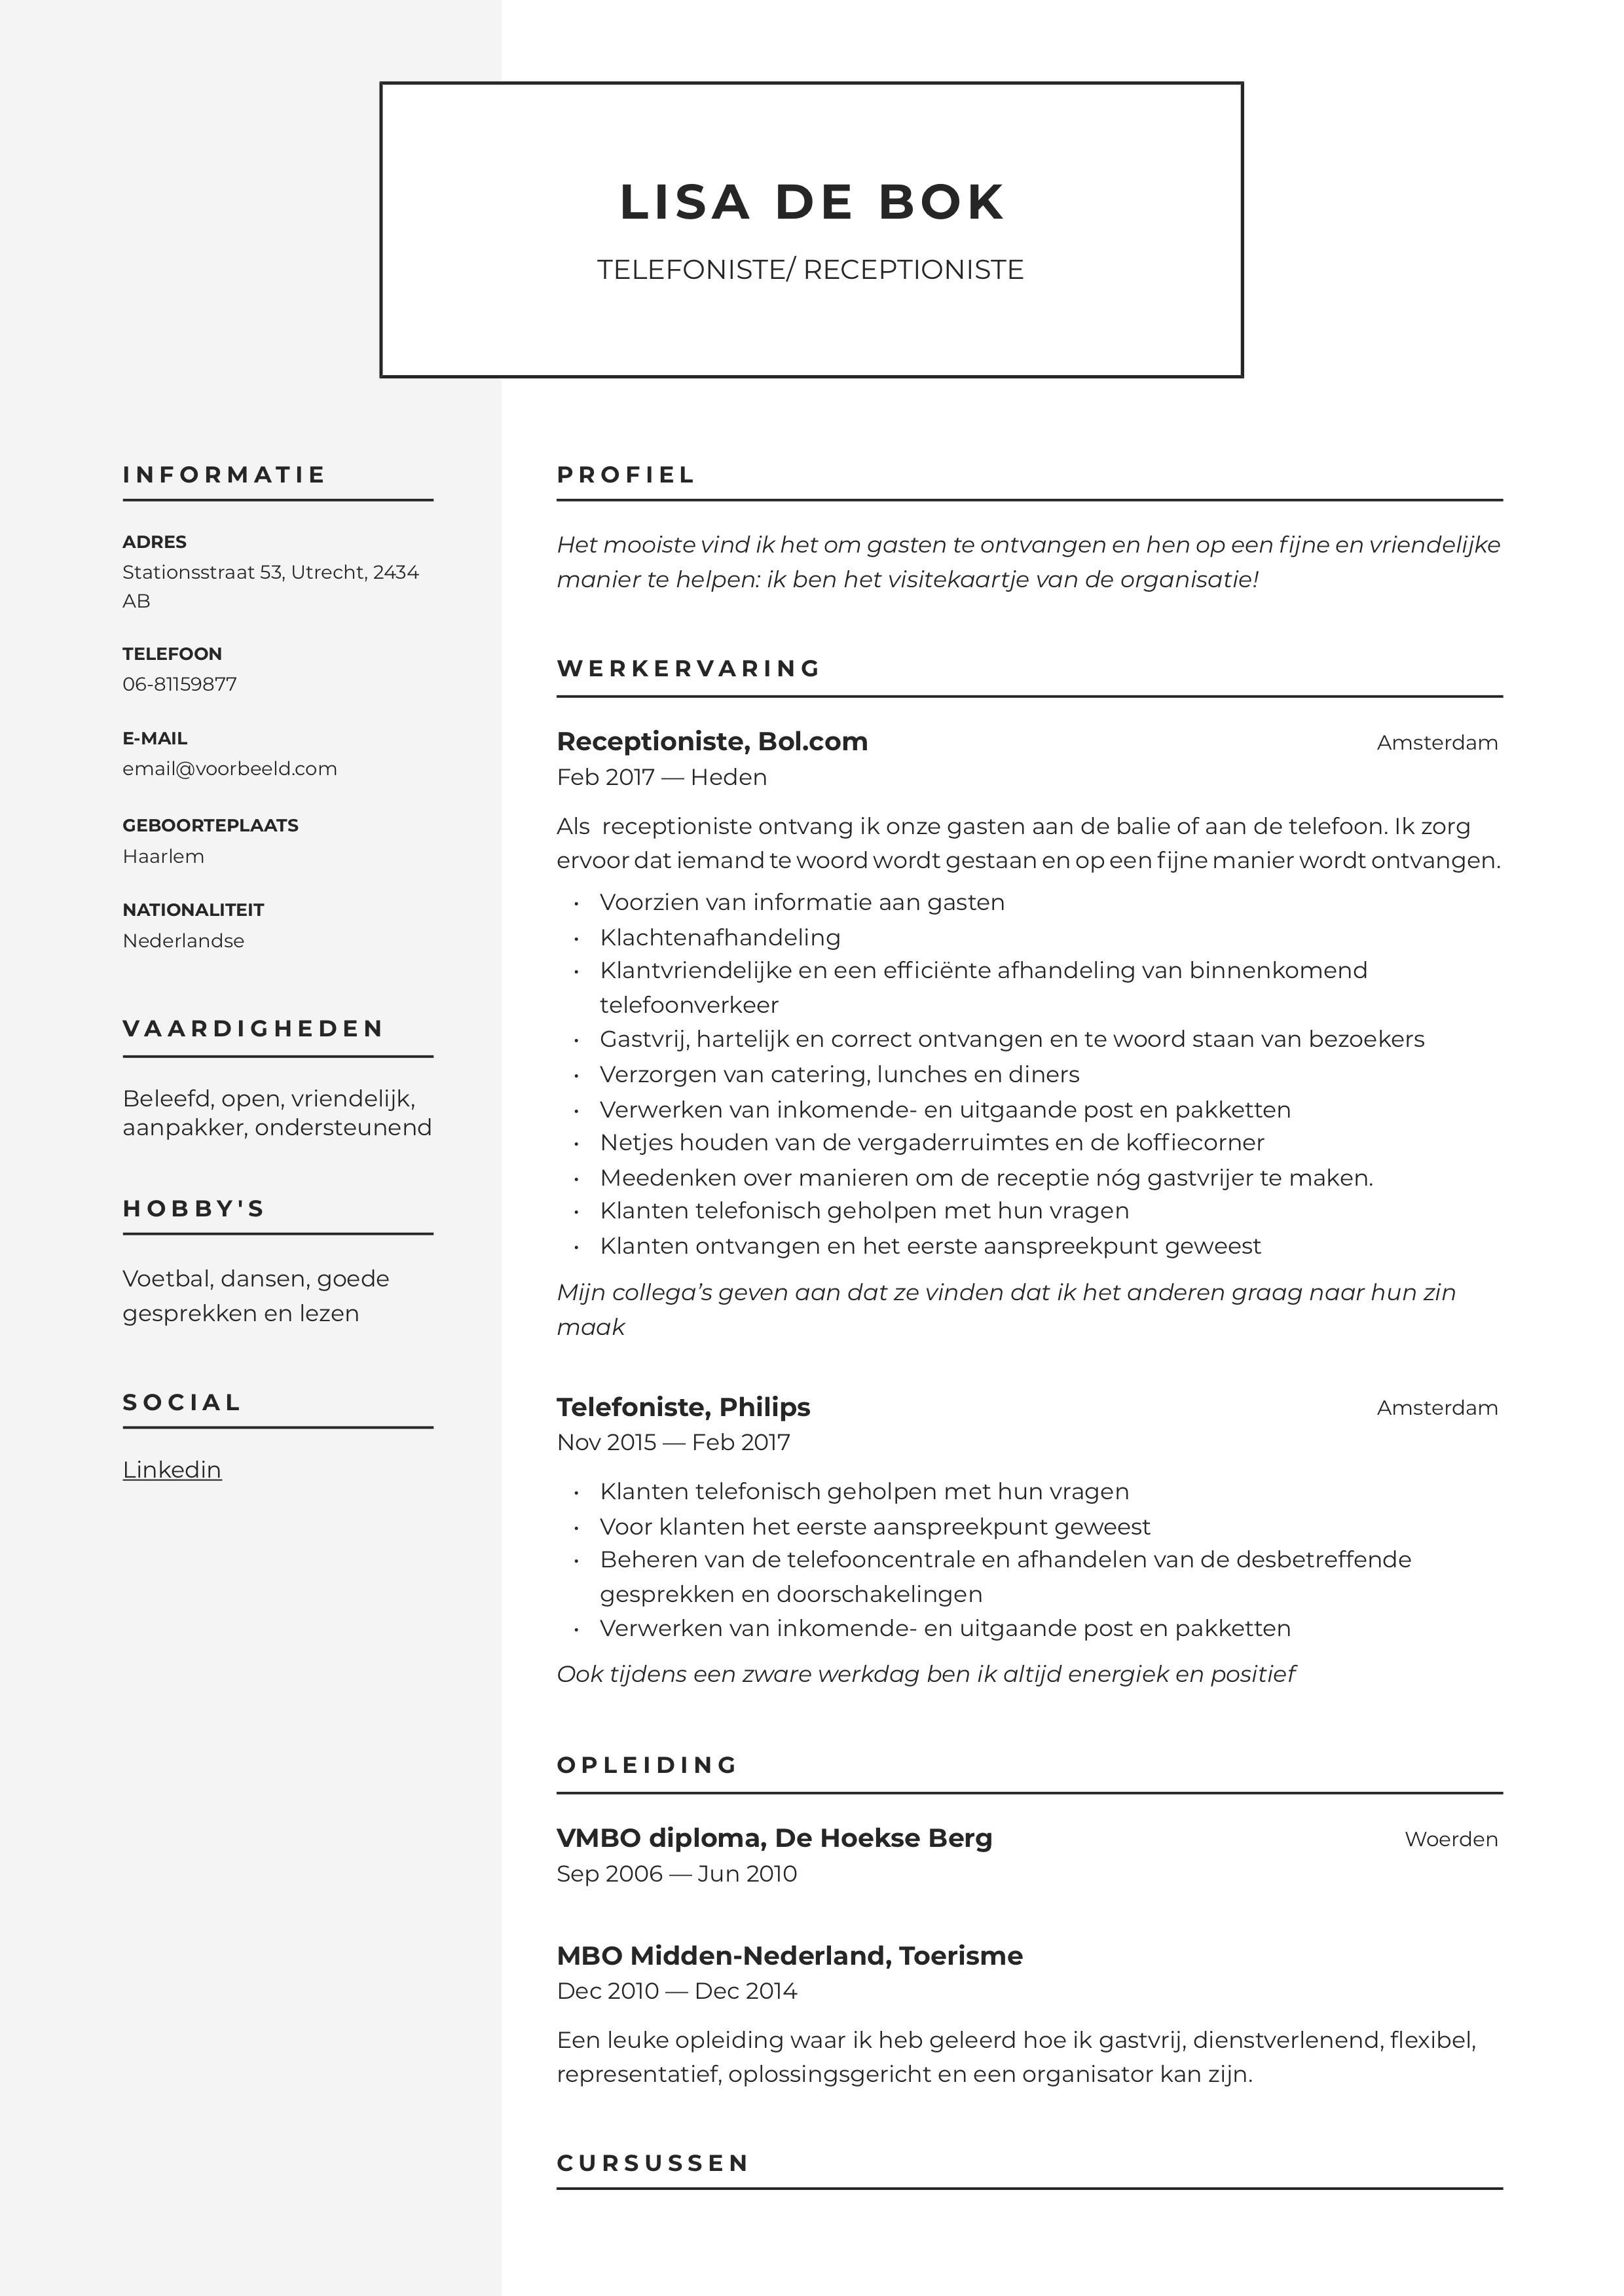 CV Telefoniste/Receptioniste